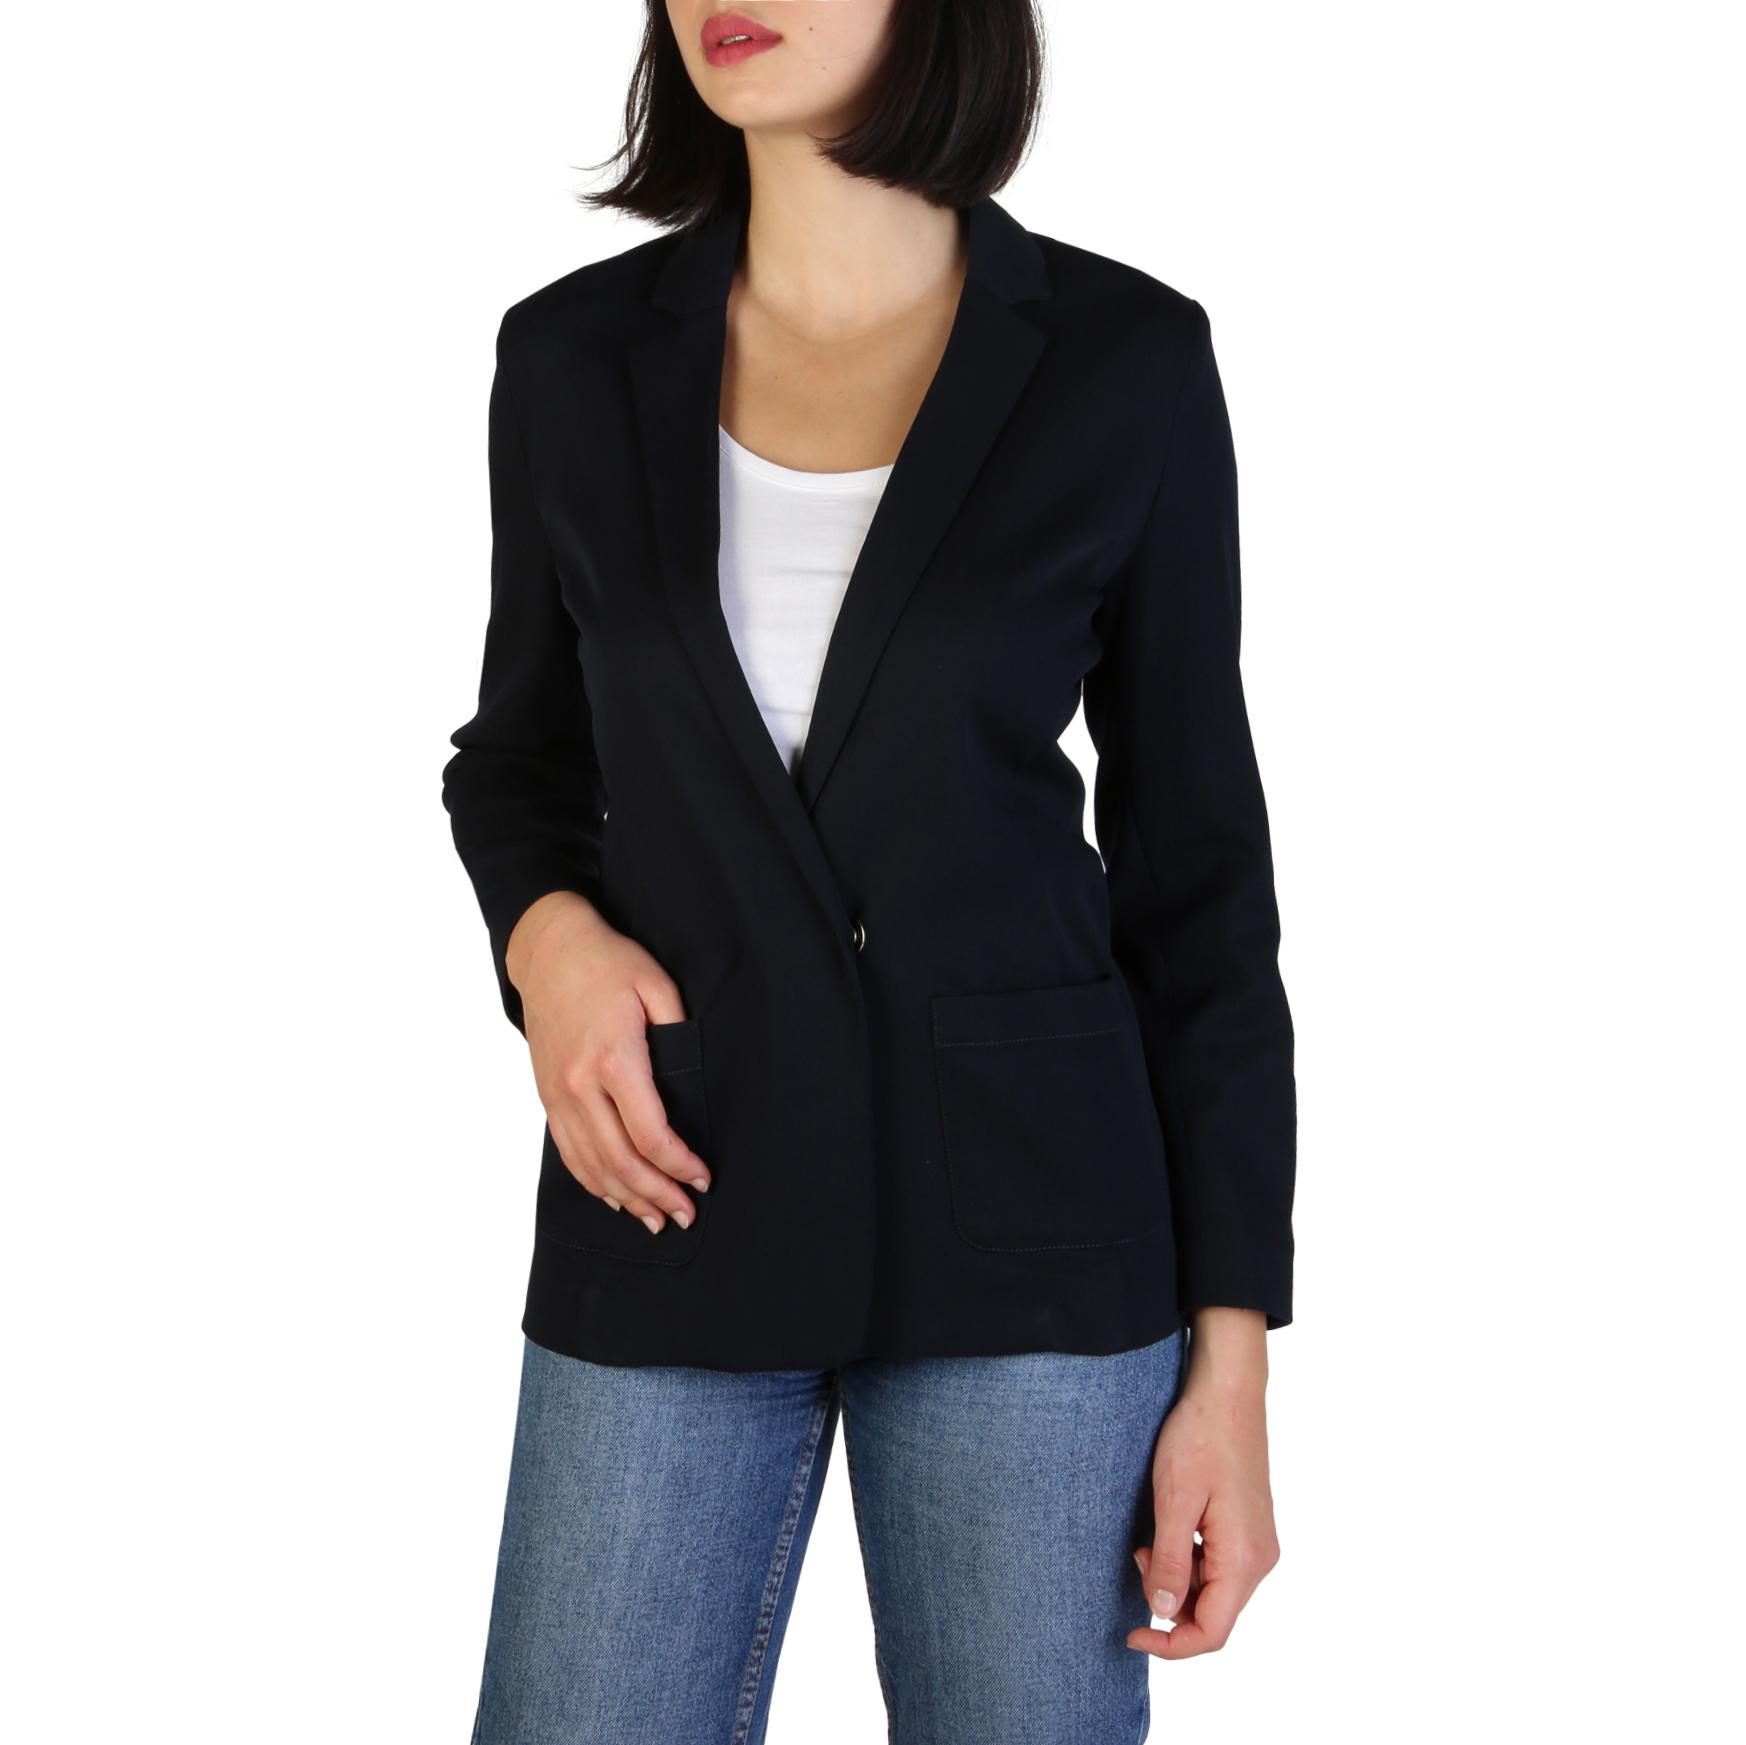 Armani Jeans 3Y5G53_5NYDZ Donna Blu 107801Armani Jeans